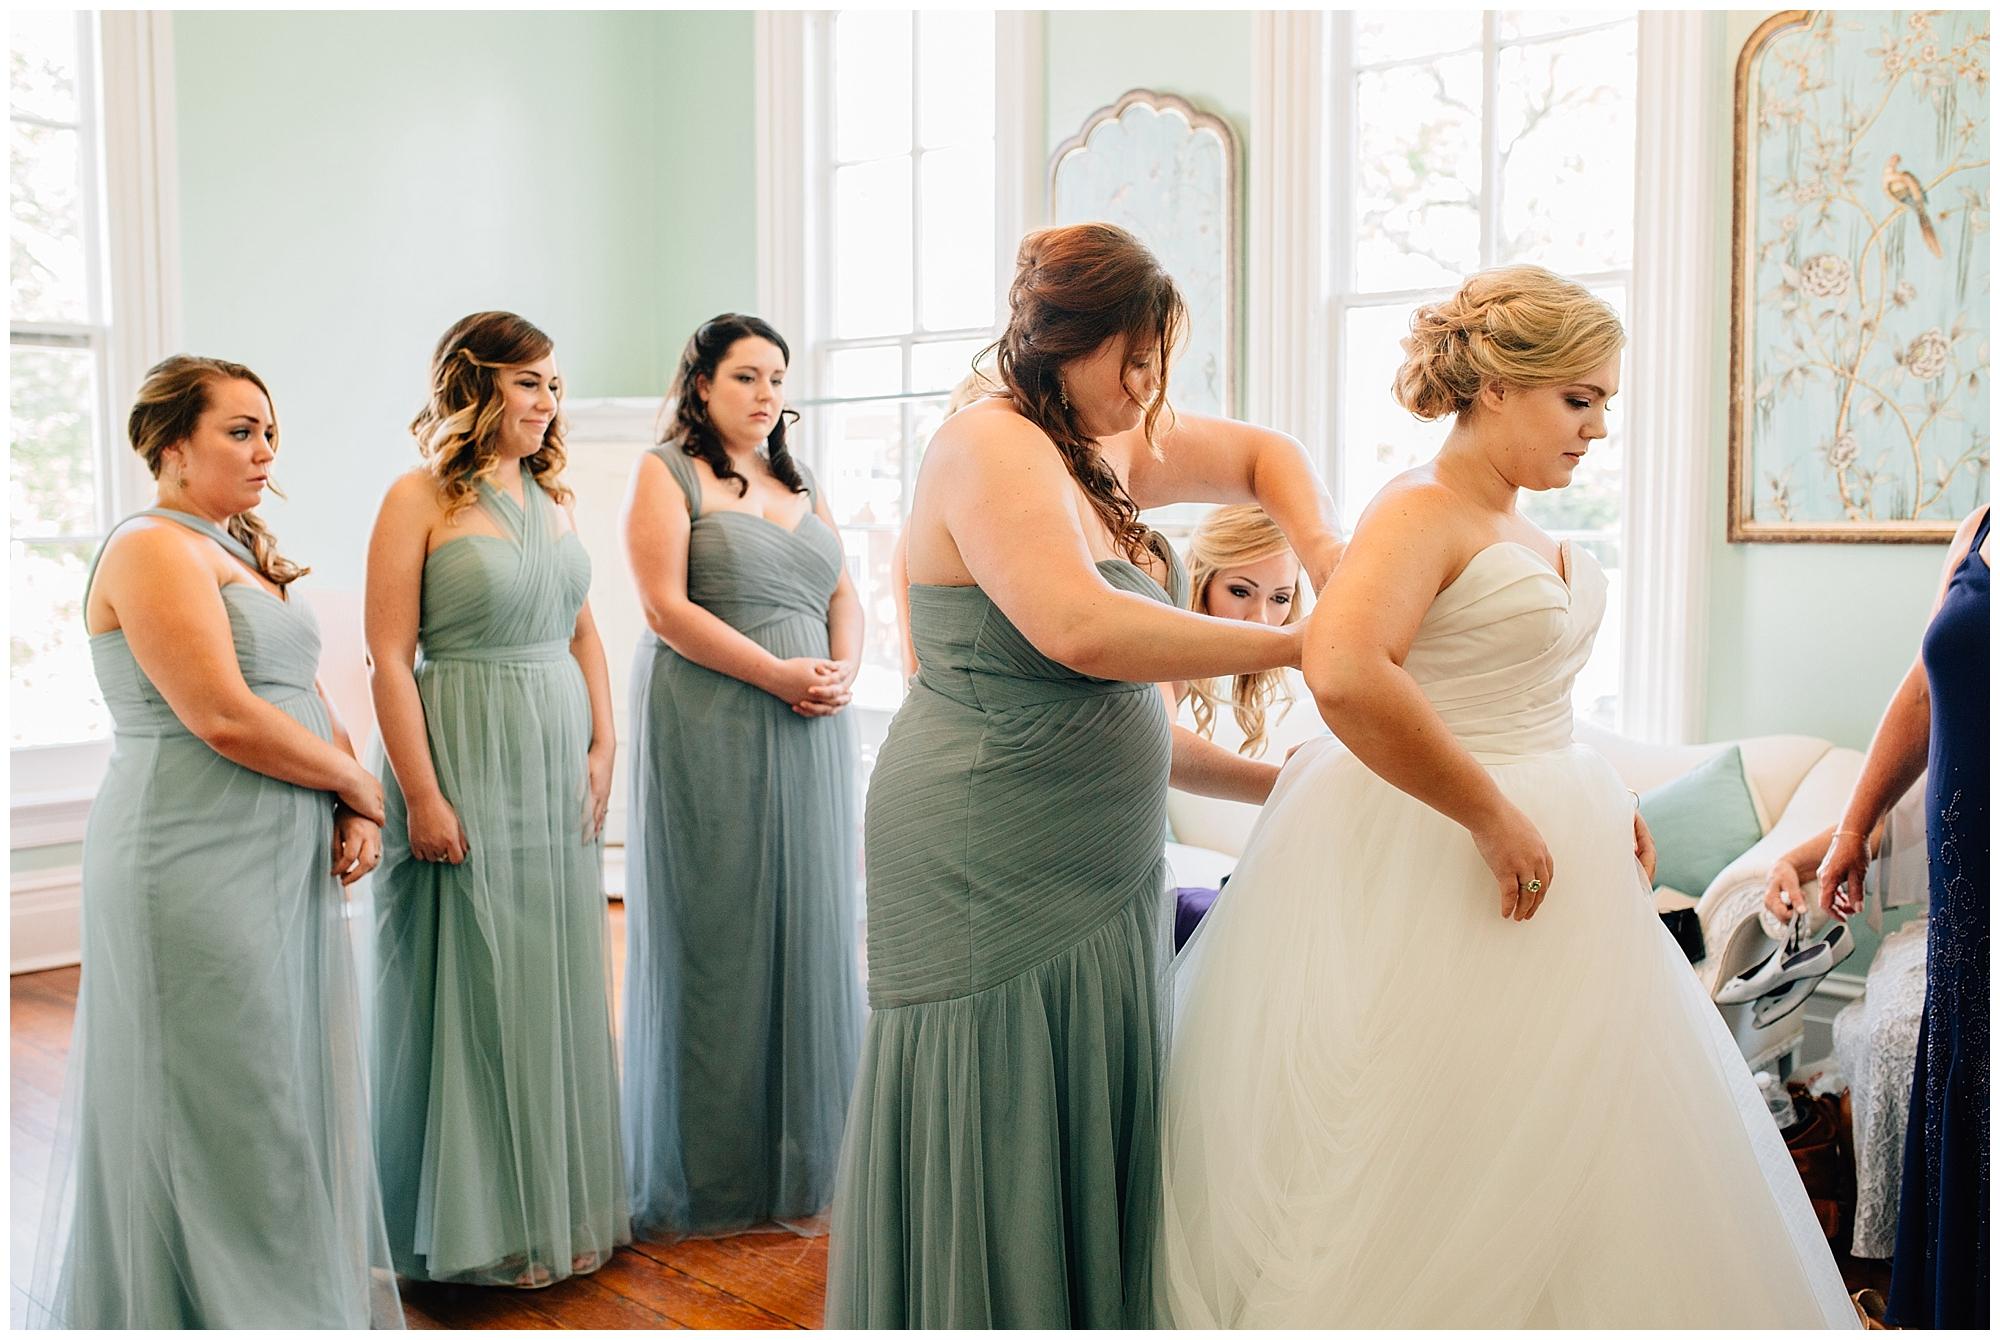 Merrimon-Wynne-Raleigh-Wedding-7.jpg